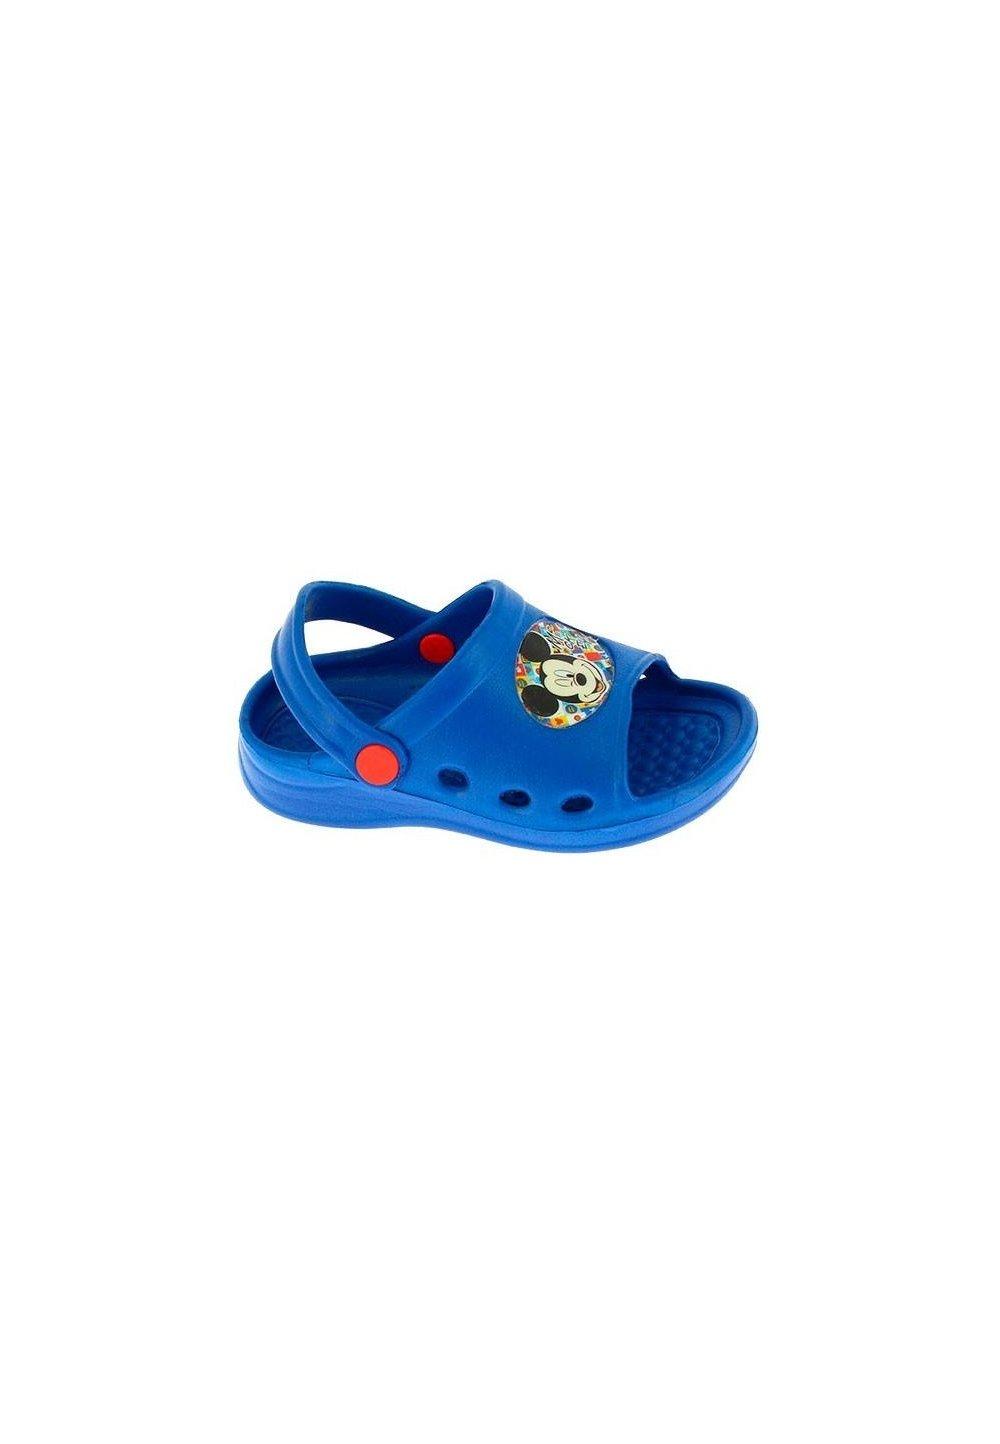 Sandale plaja, albastre, Mickey Mouse